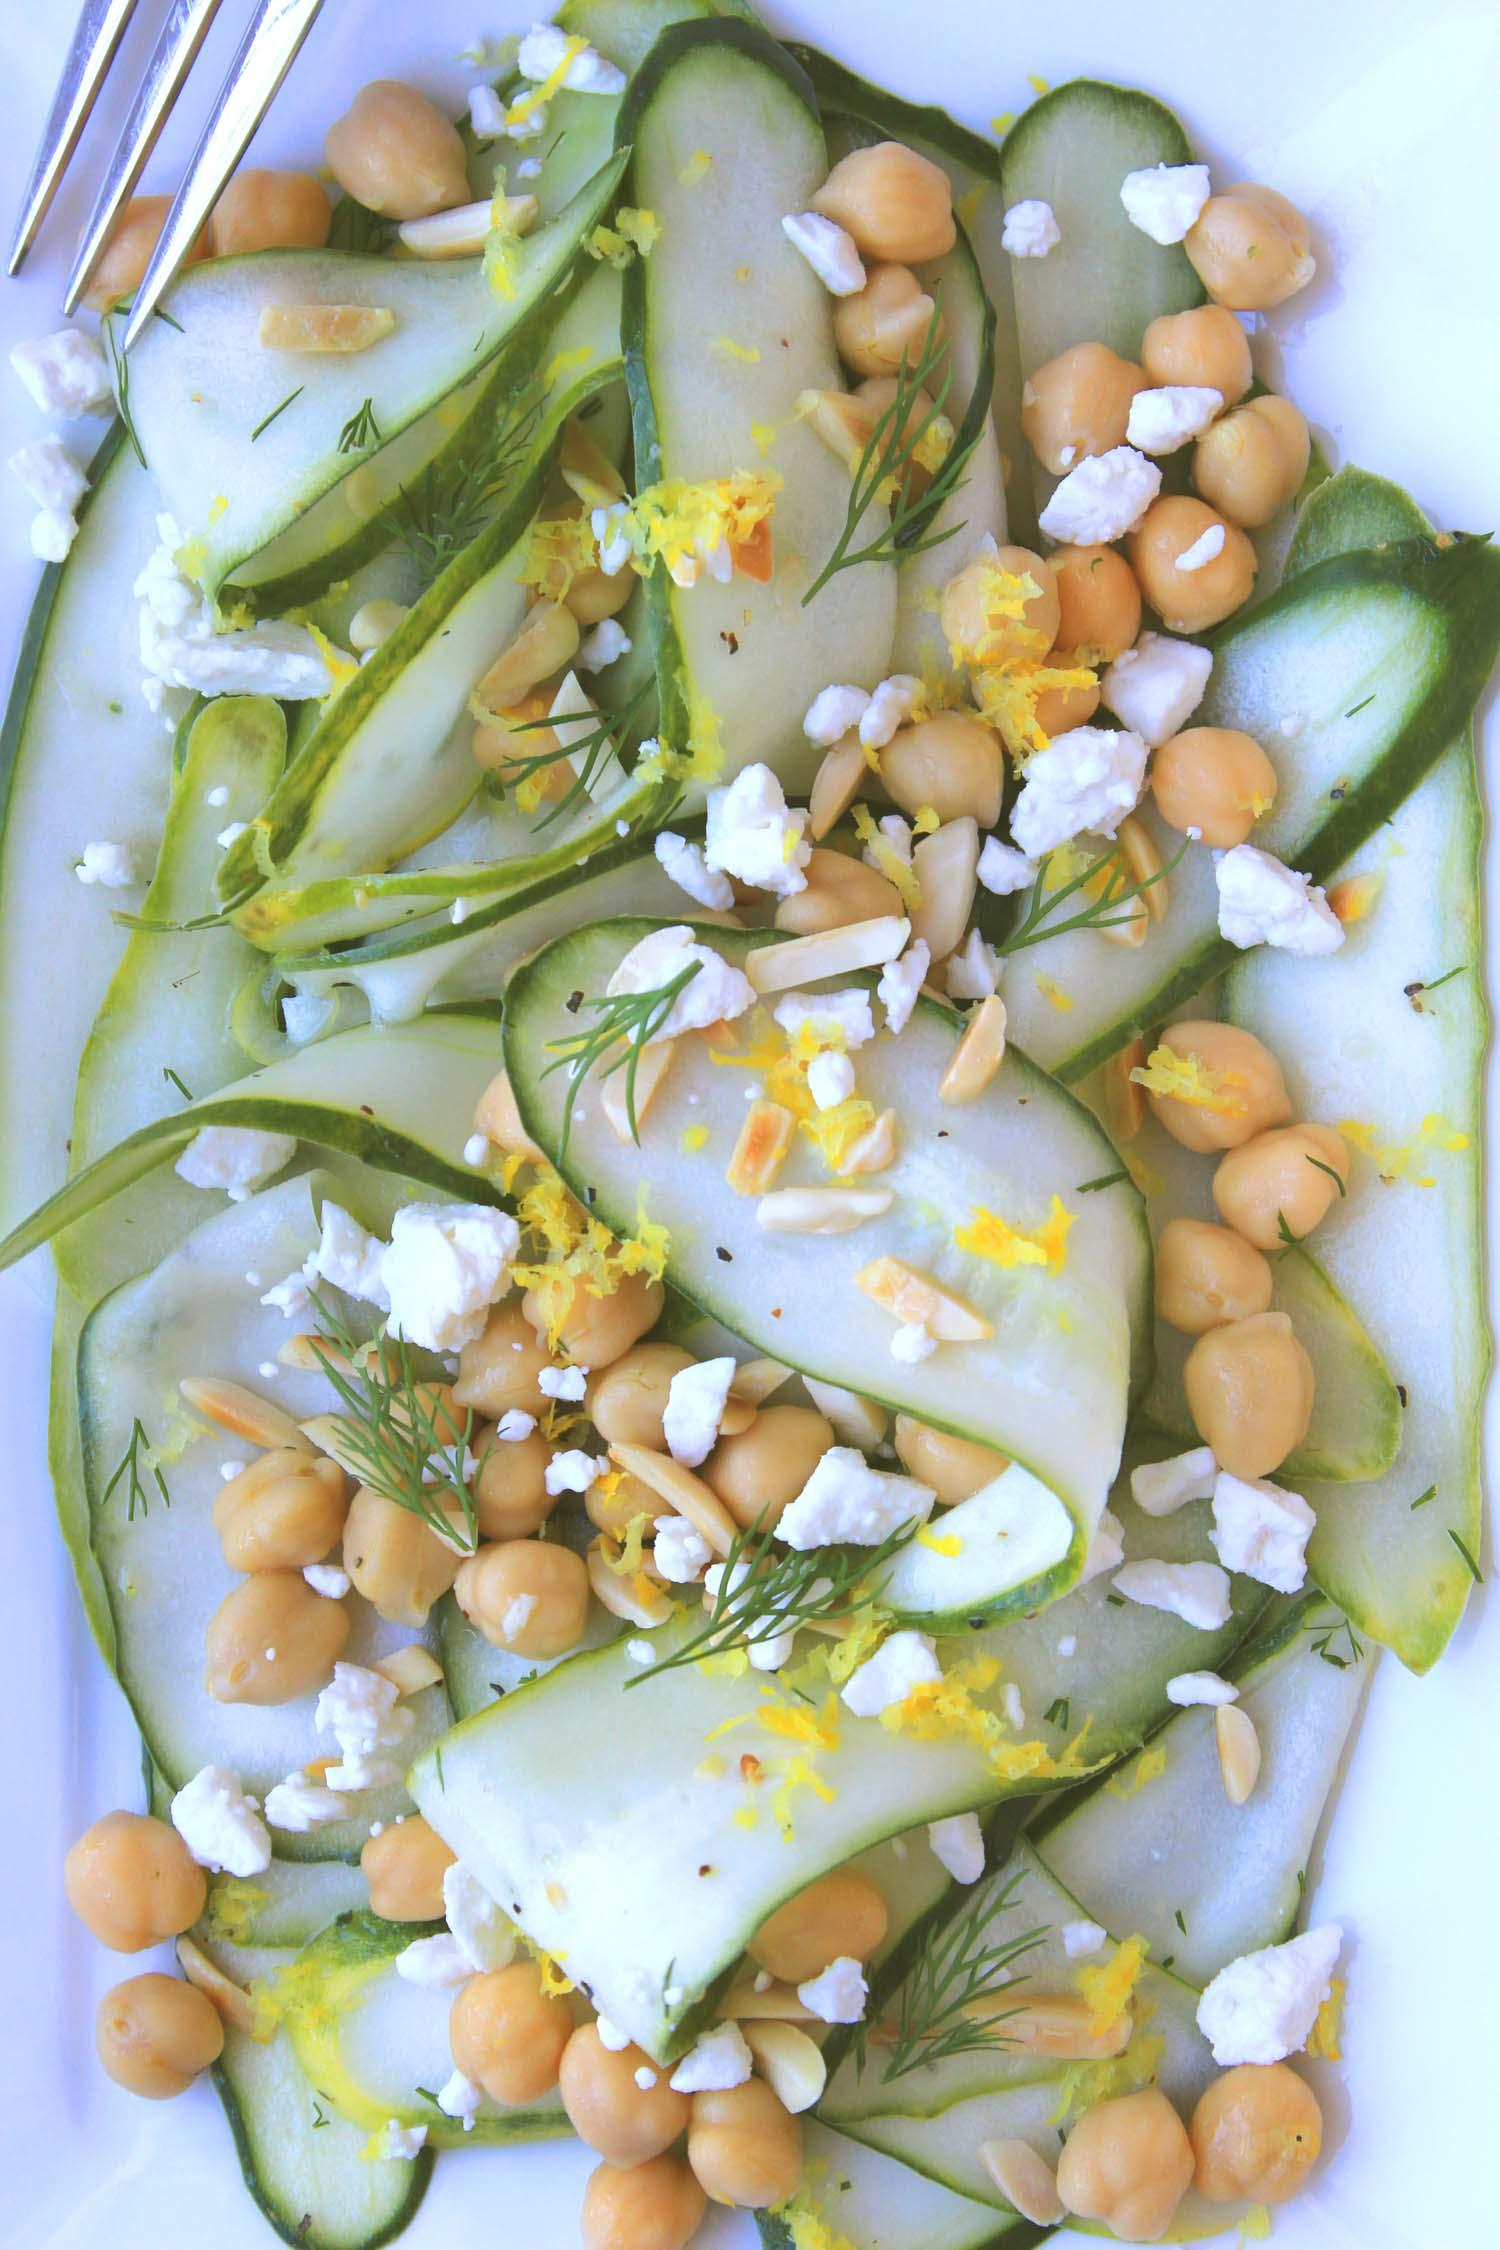 Lemony Cucumber Salad with Chickpeas  | Image:  Laura Messersmith